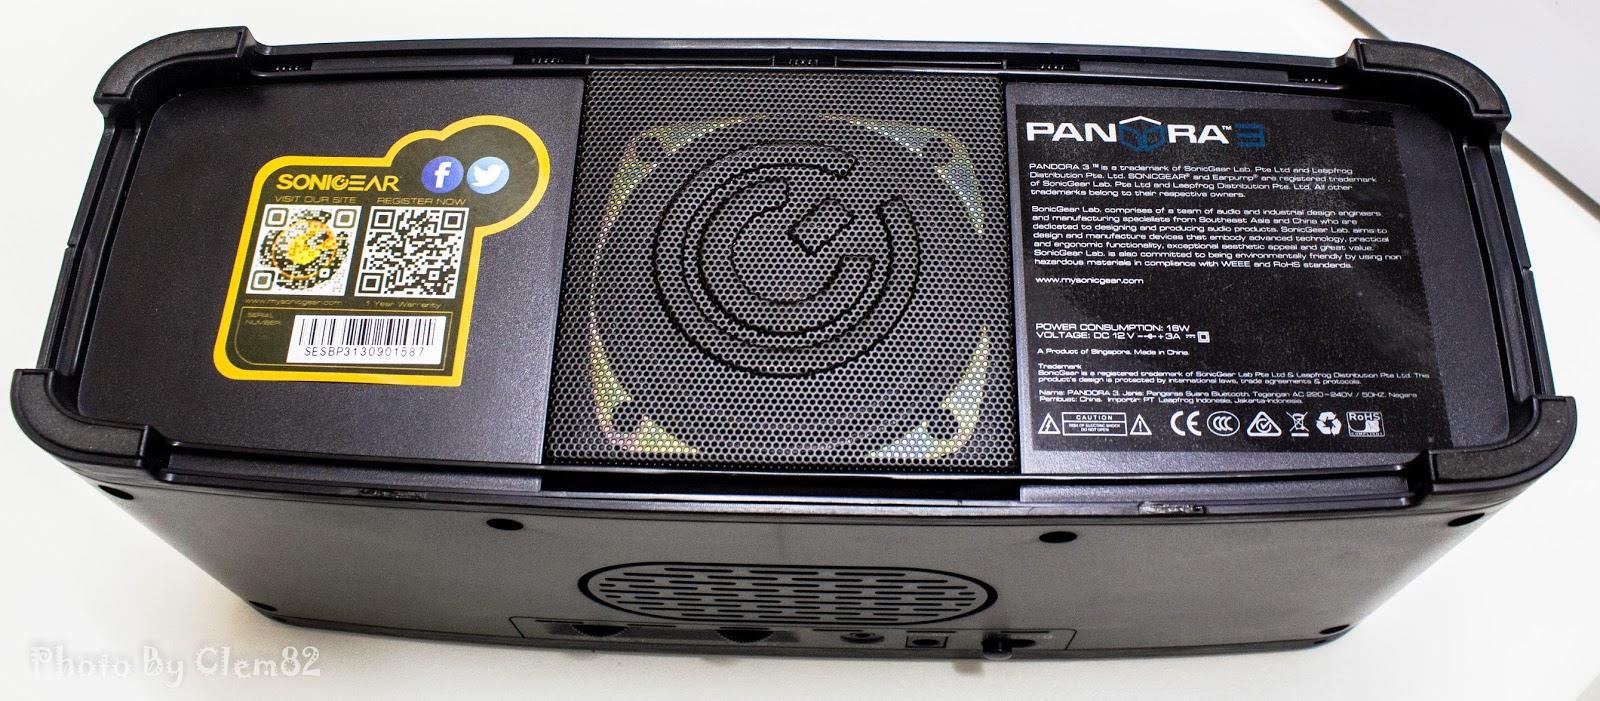 Opening Pandora's Box: SonicGear Pandora Wireless Bluetooth Media Player Series 30